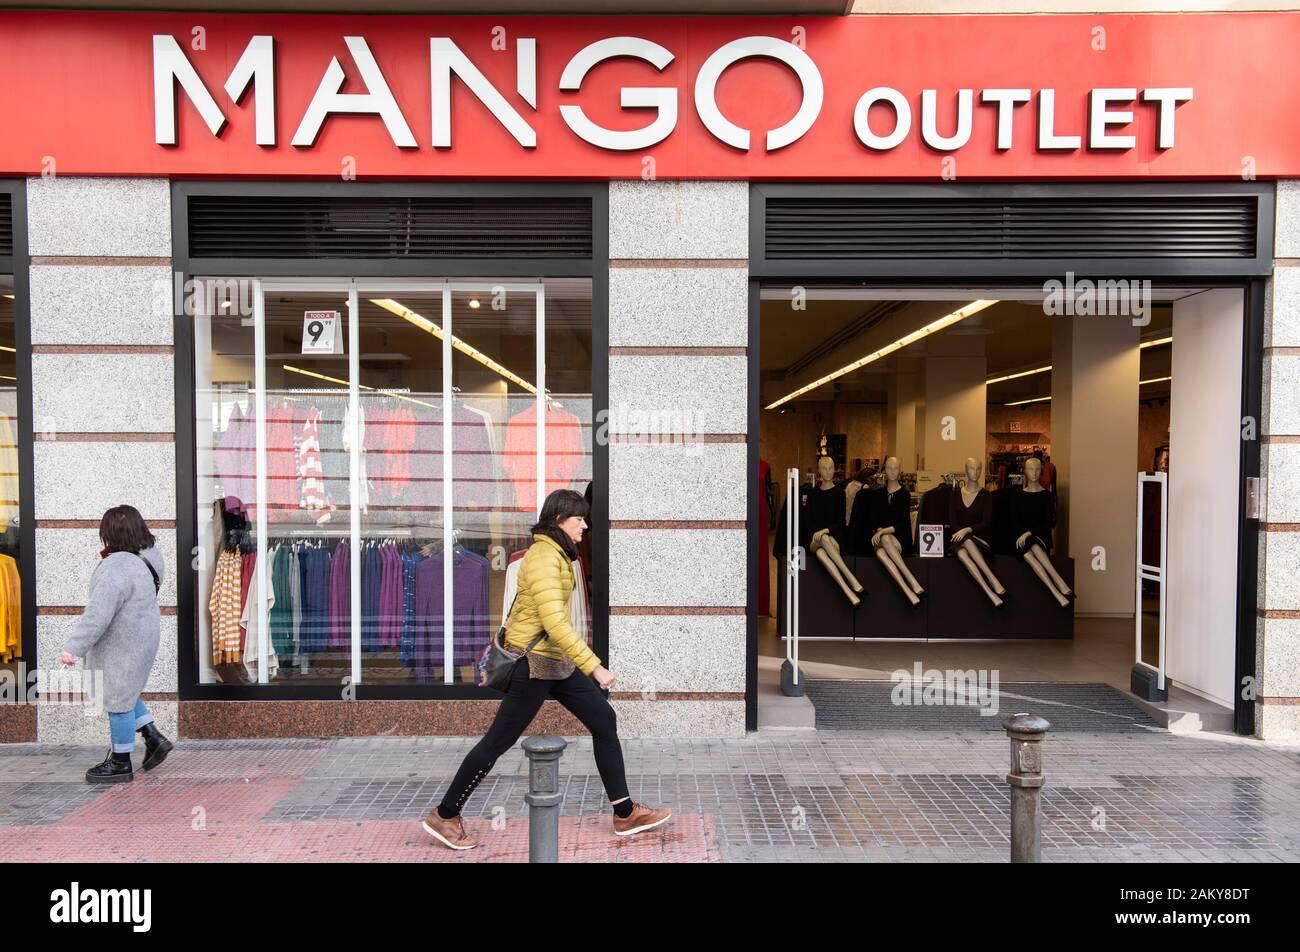 Mango Outlet Fotos e Imágenes de stock Alamy